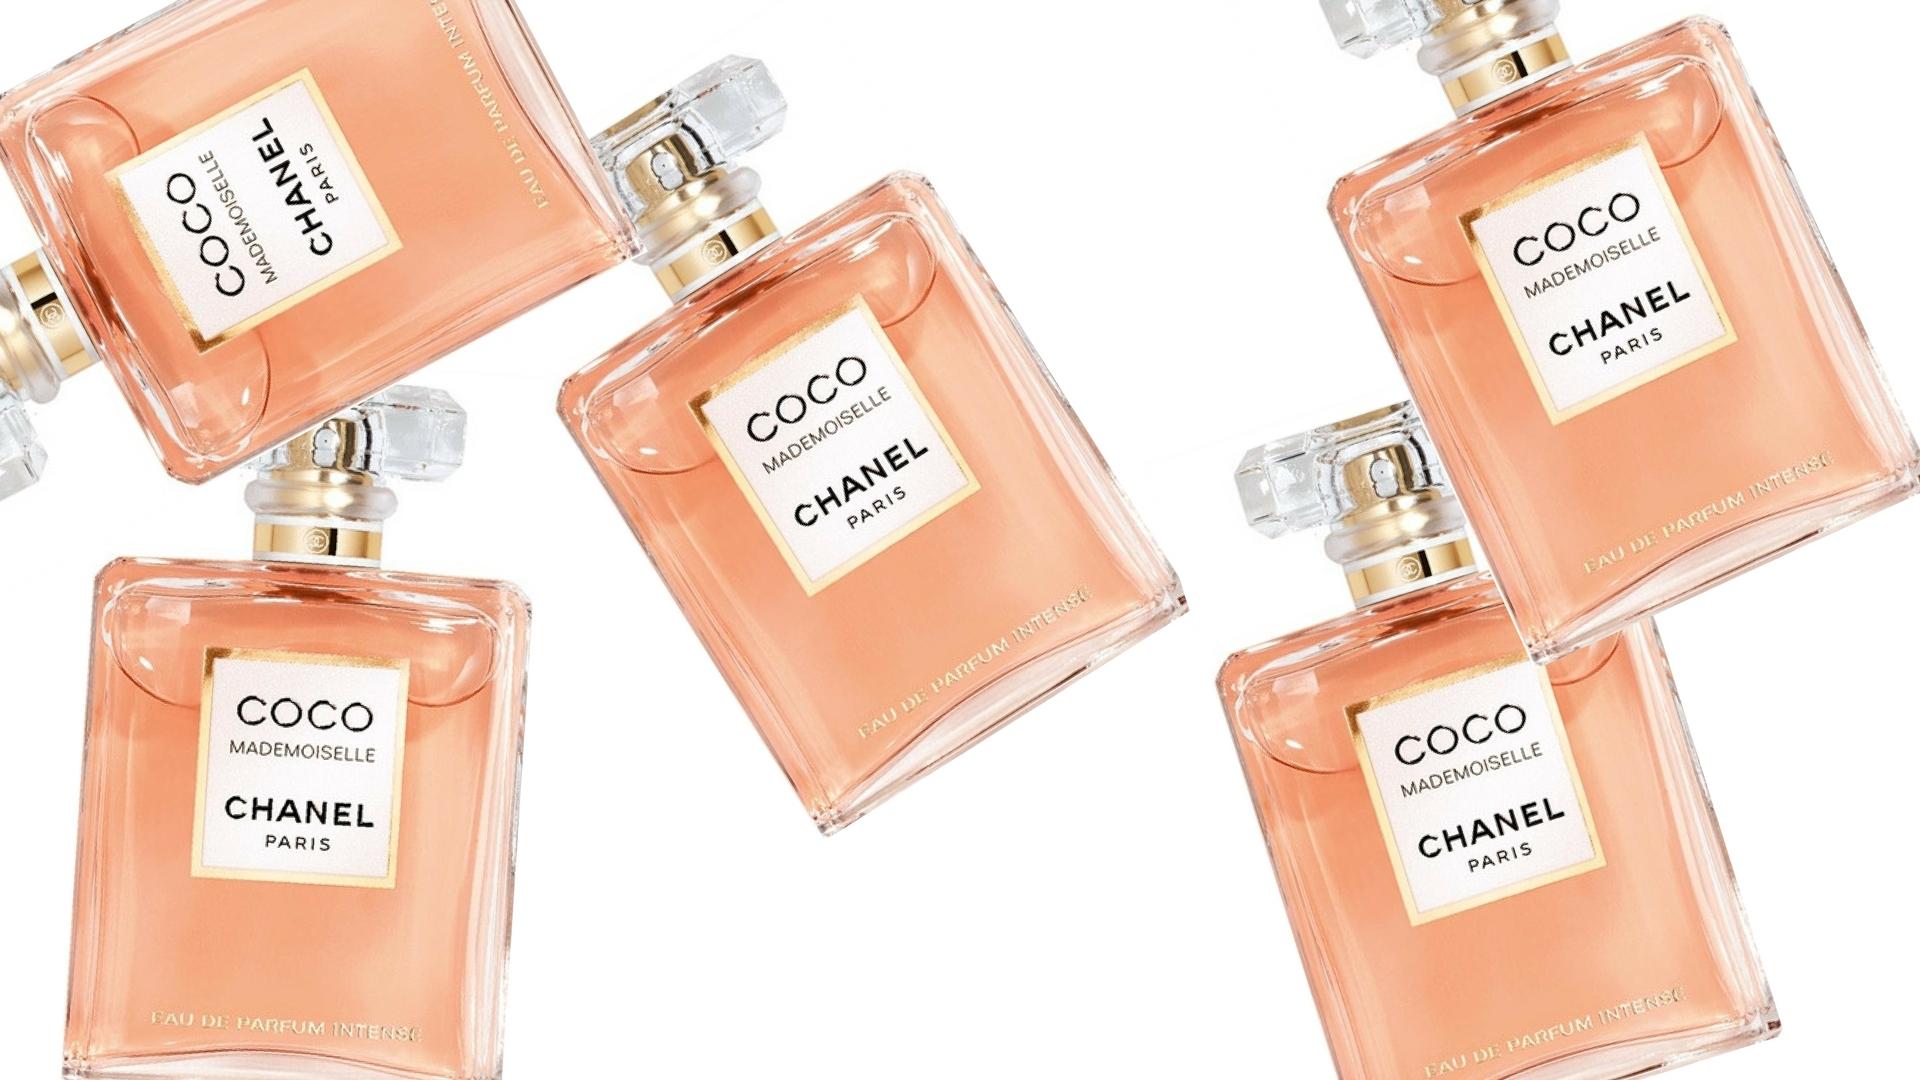 New Coco Mademoiselle Intense Eau De Parfum Angela Van Rose